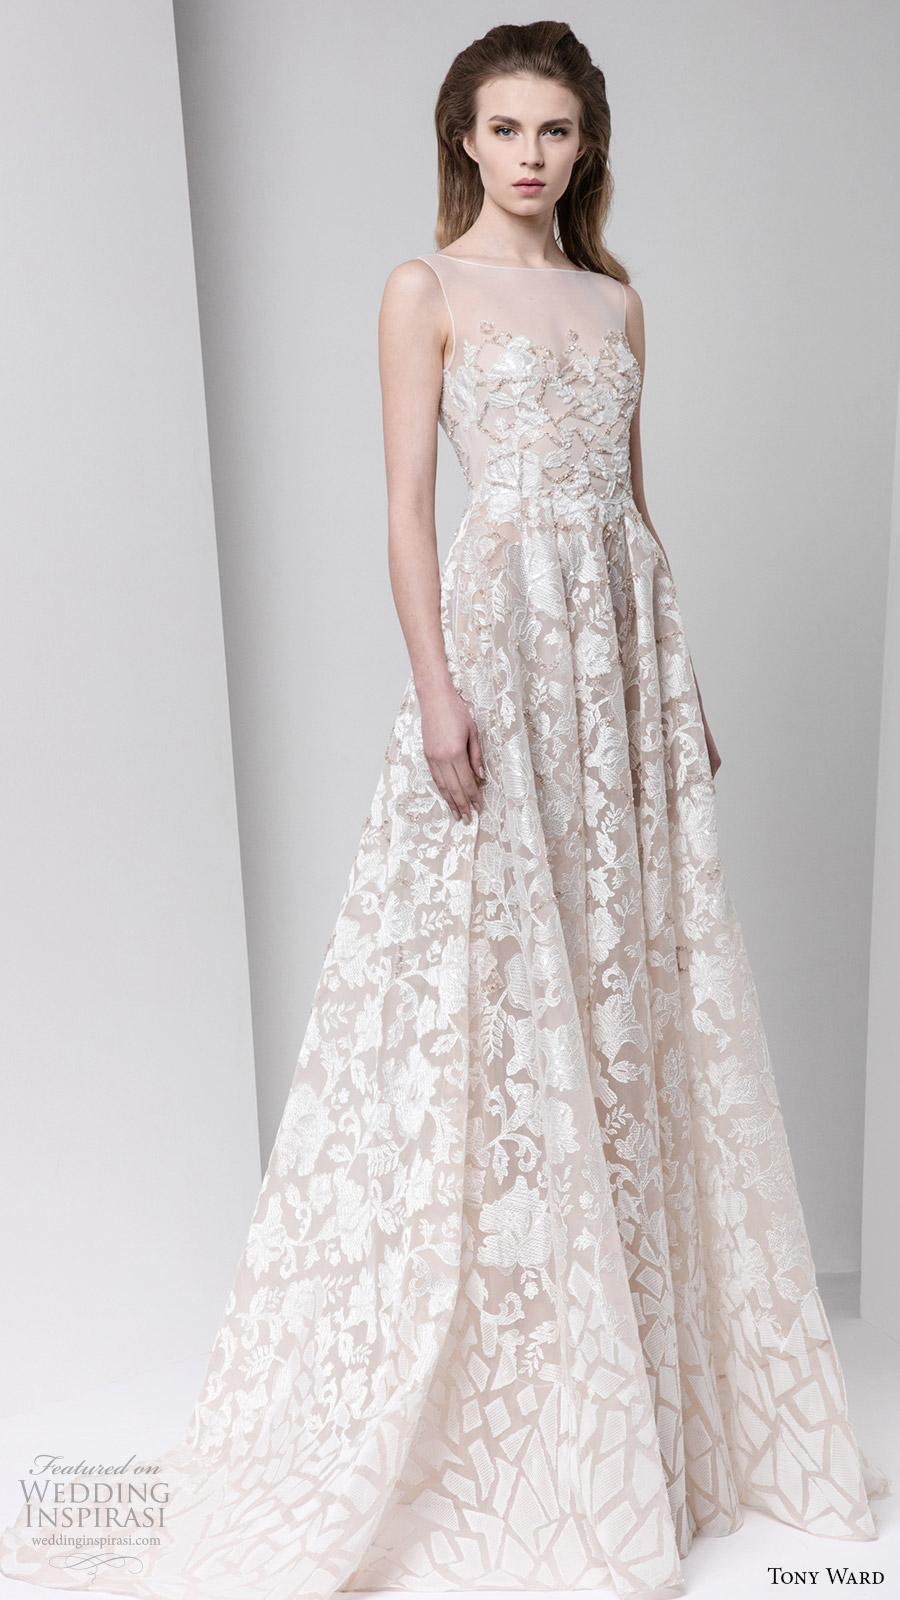 tony ward fall winter 2016 2017 rtw sleeveless illusion bateau neck a line off white evening dress bridal inspiration